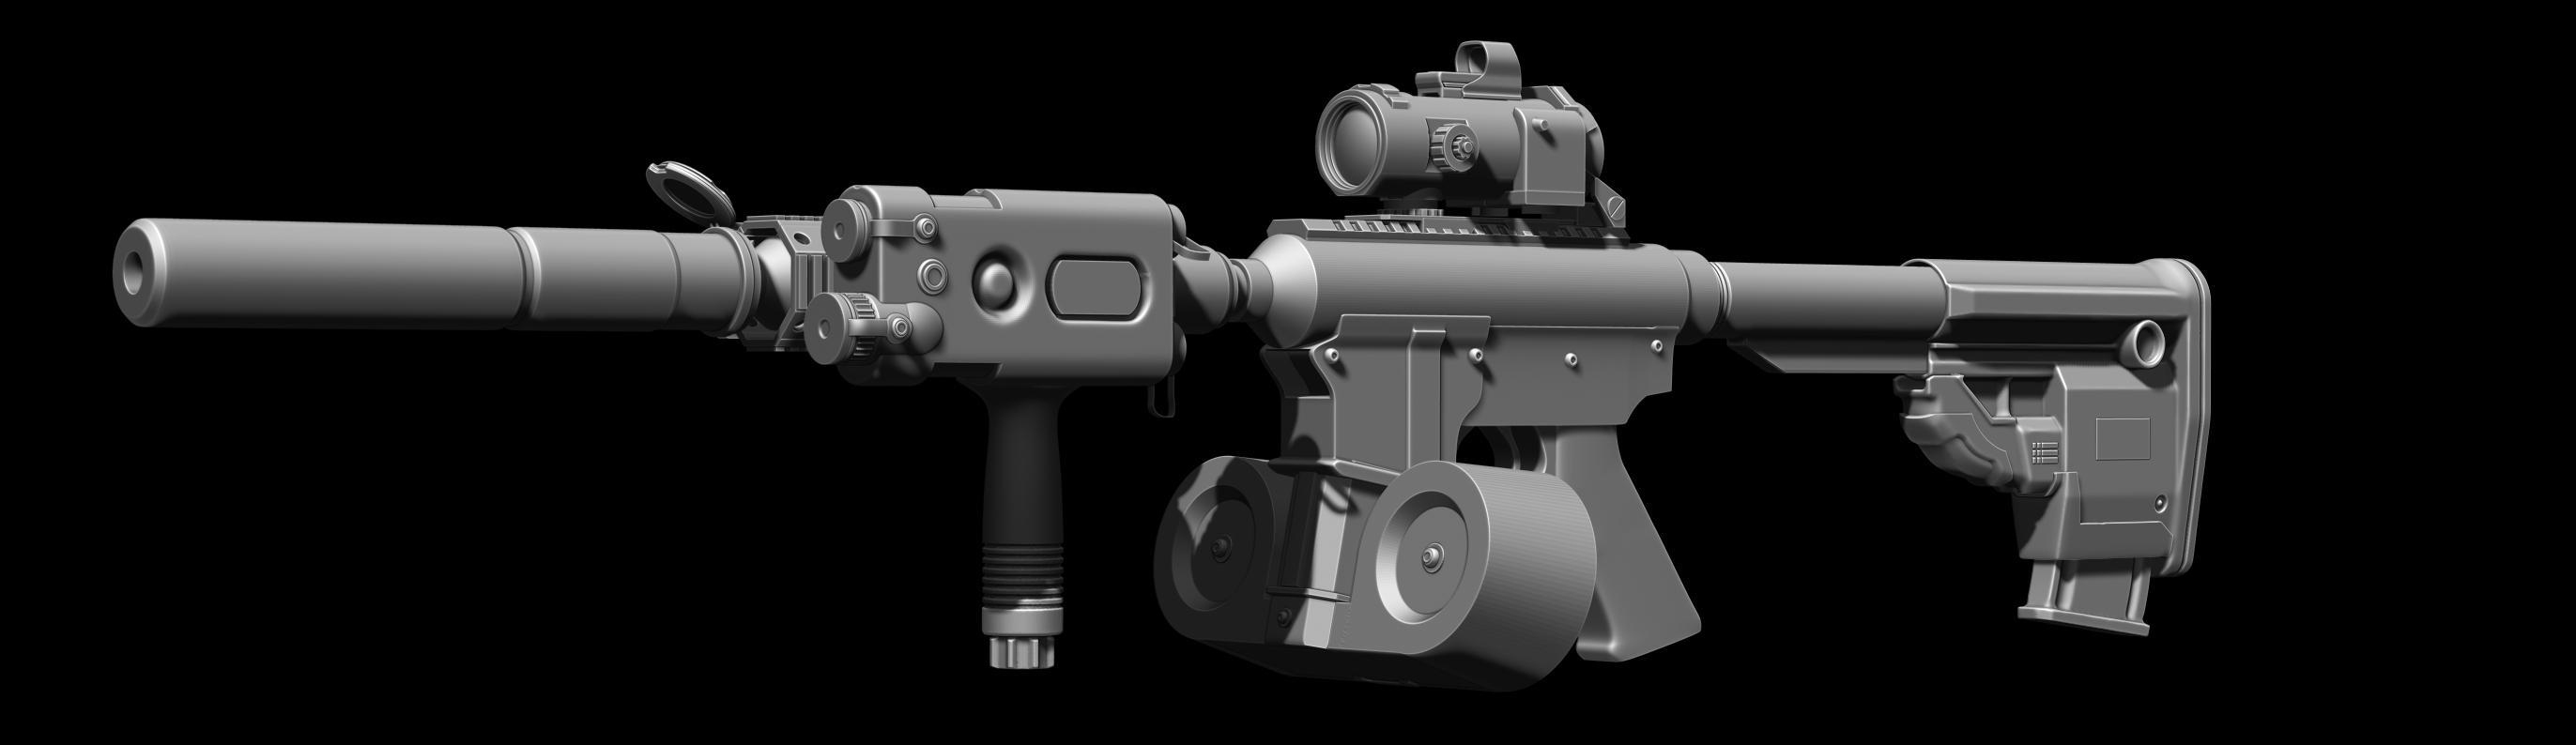 M4 Assault Rifle By Chofni1996 On DeviantArt